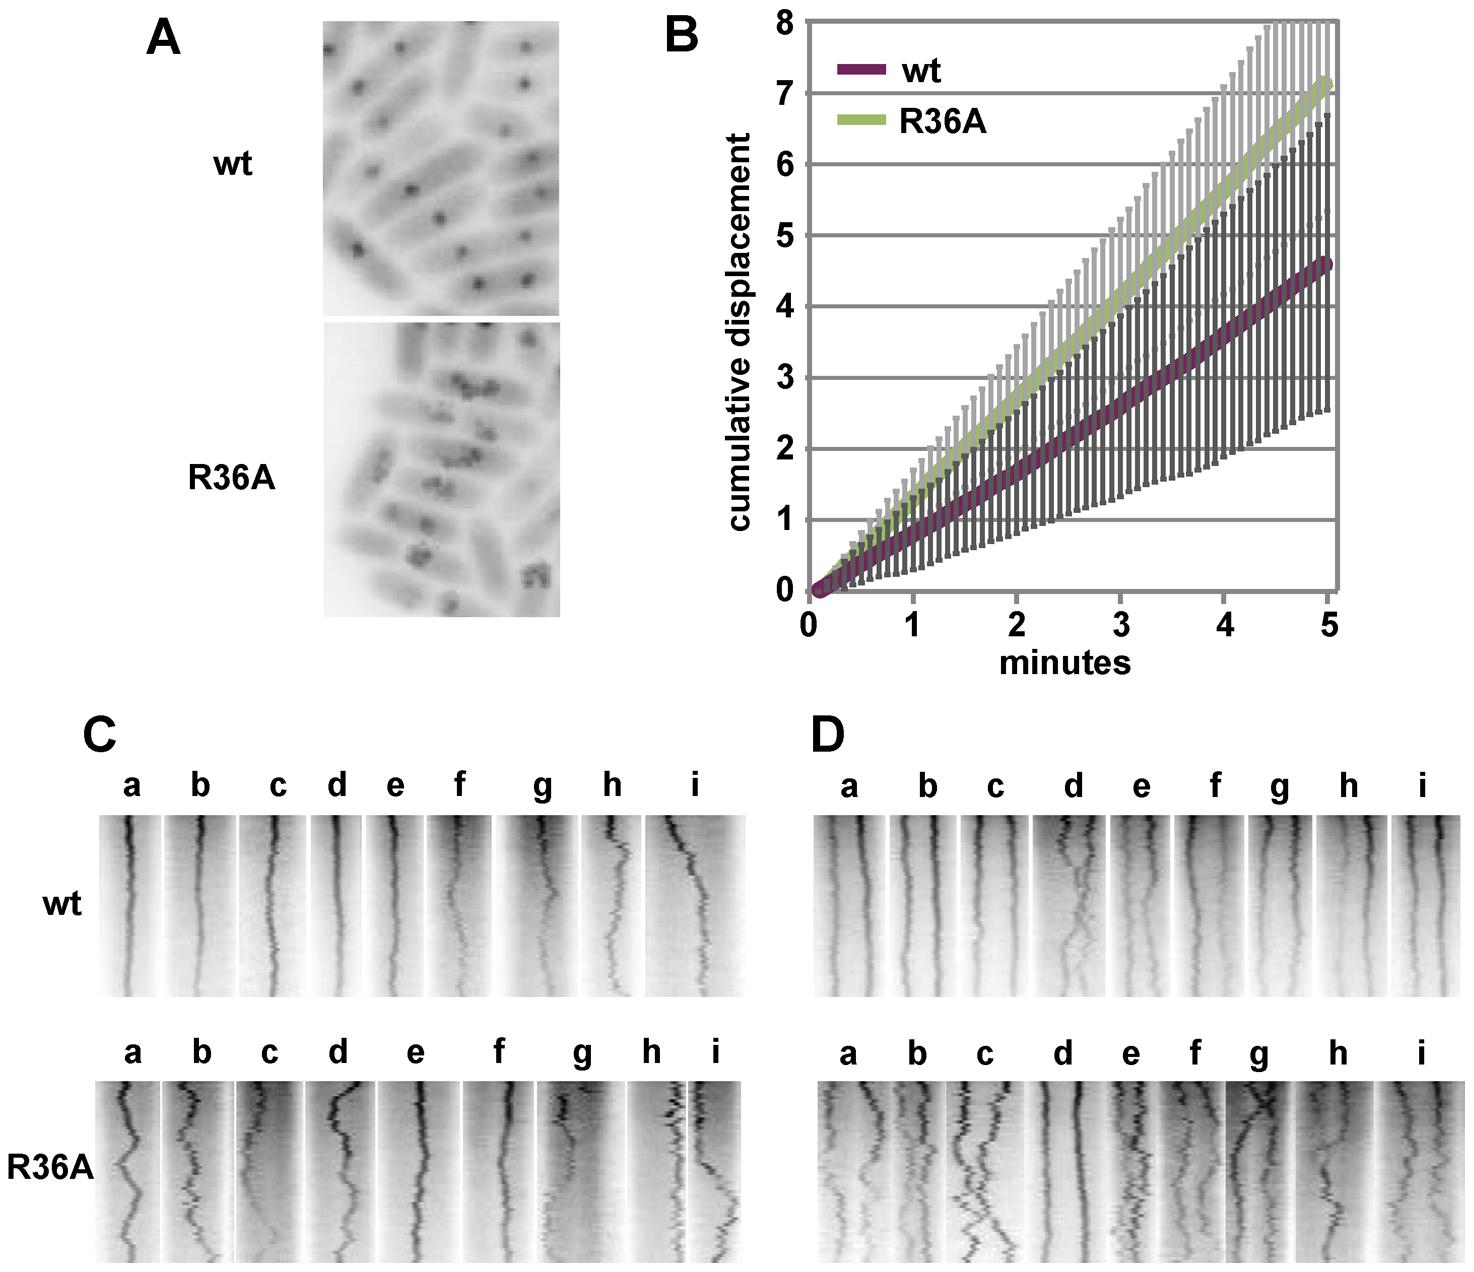 Effect of R36A mutation on mini-F movement.